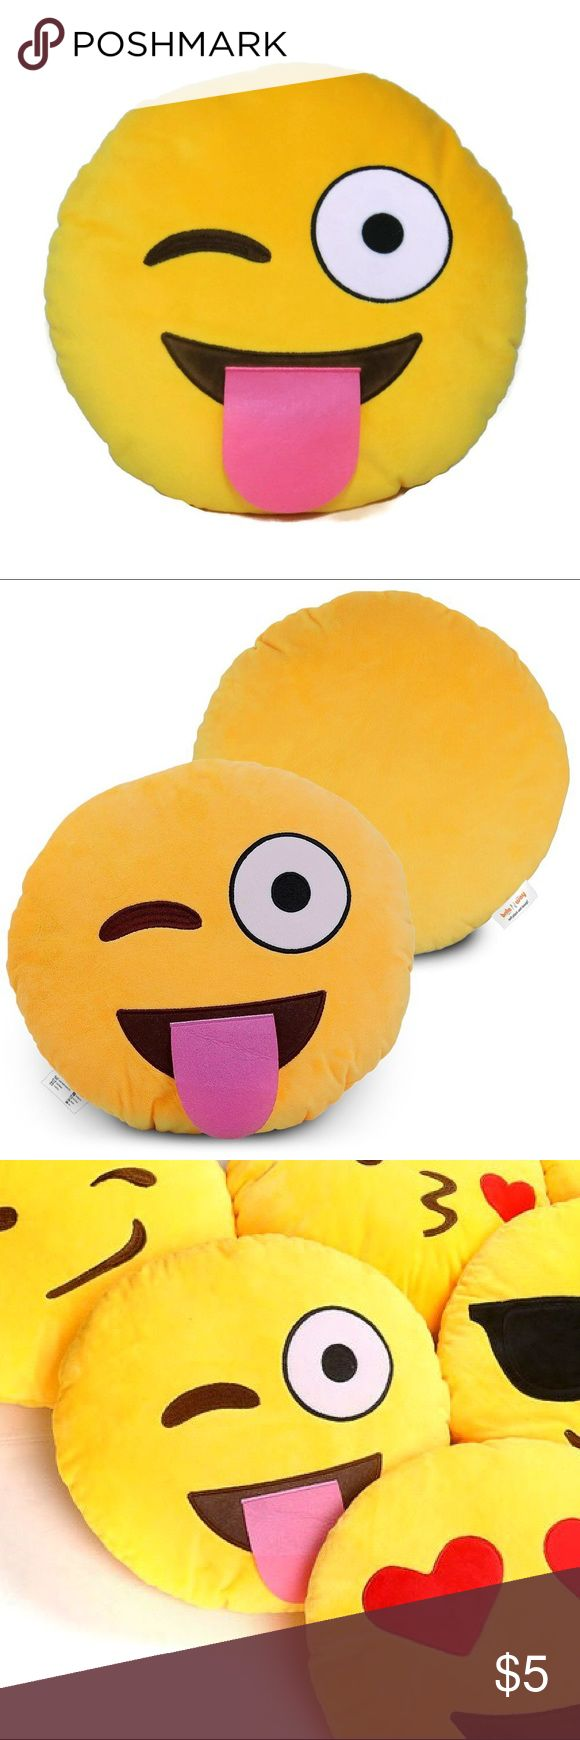 Wink naughty emoji pillow emoji biocorpaavc